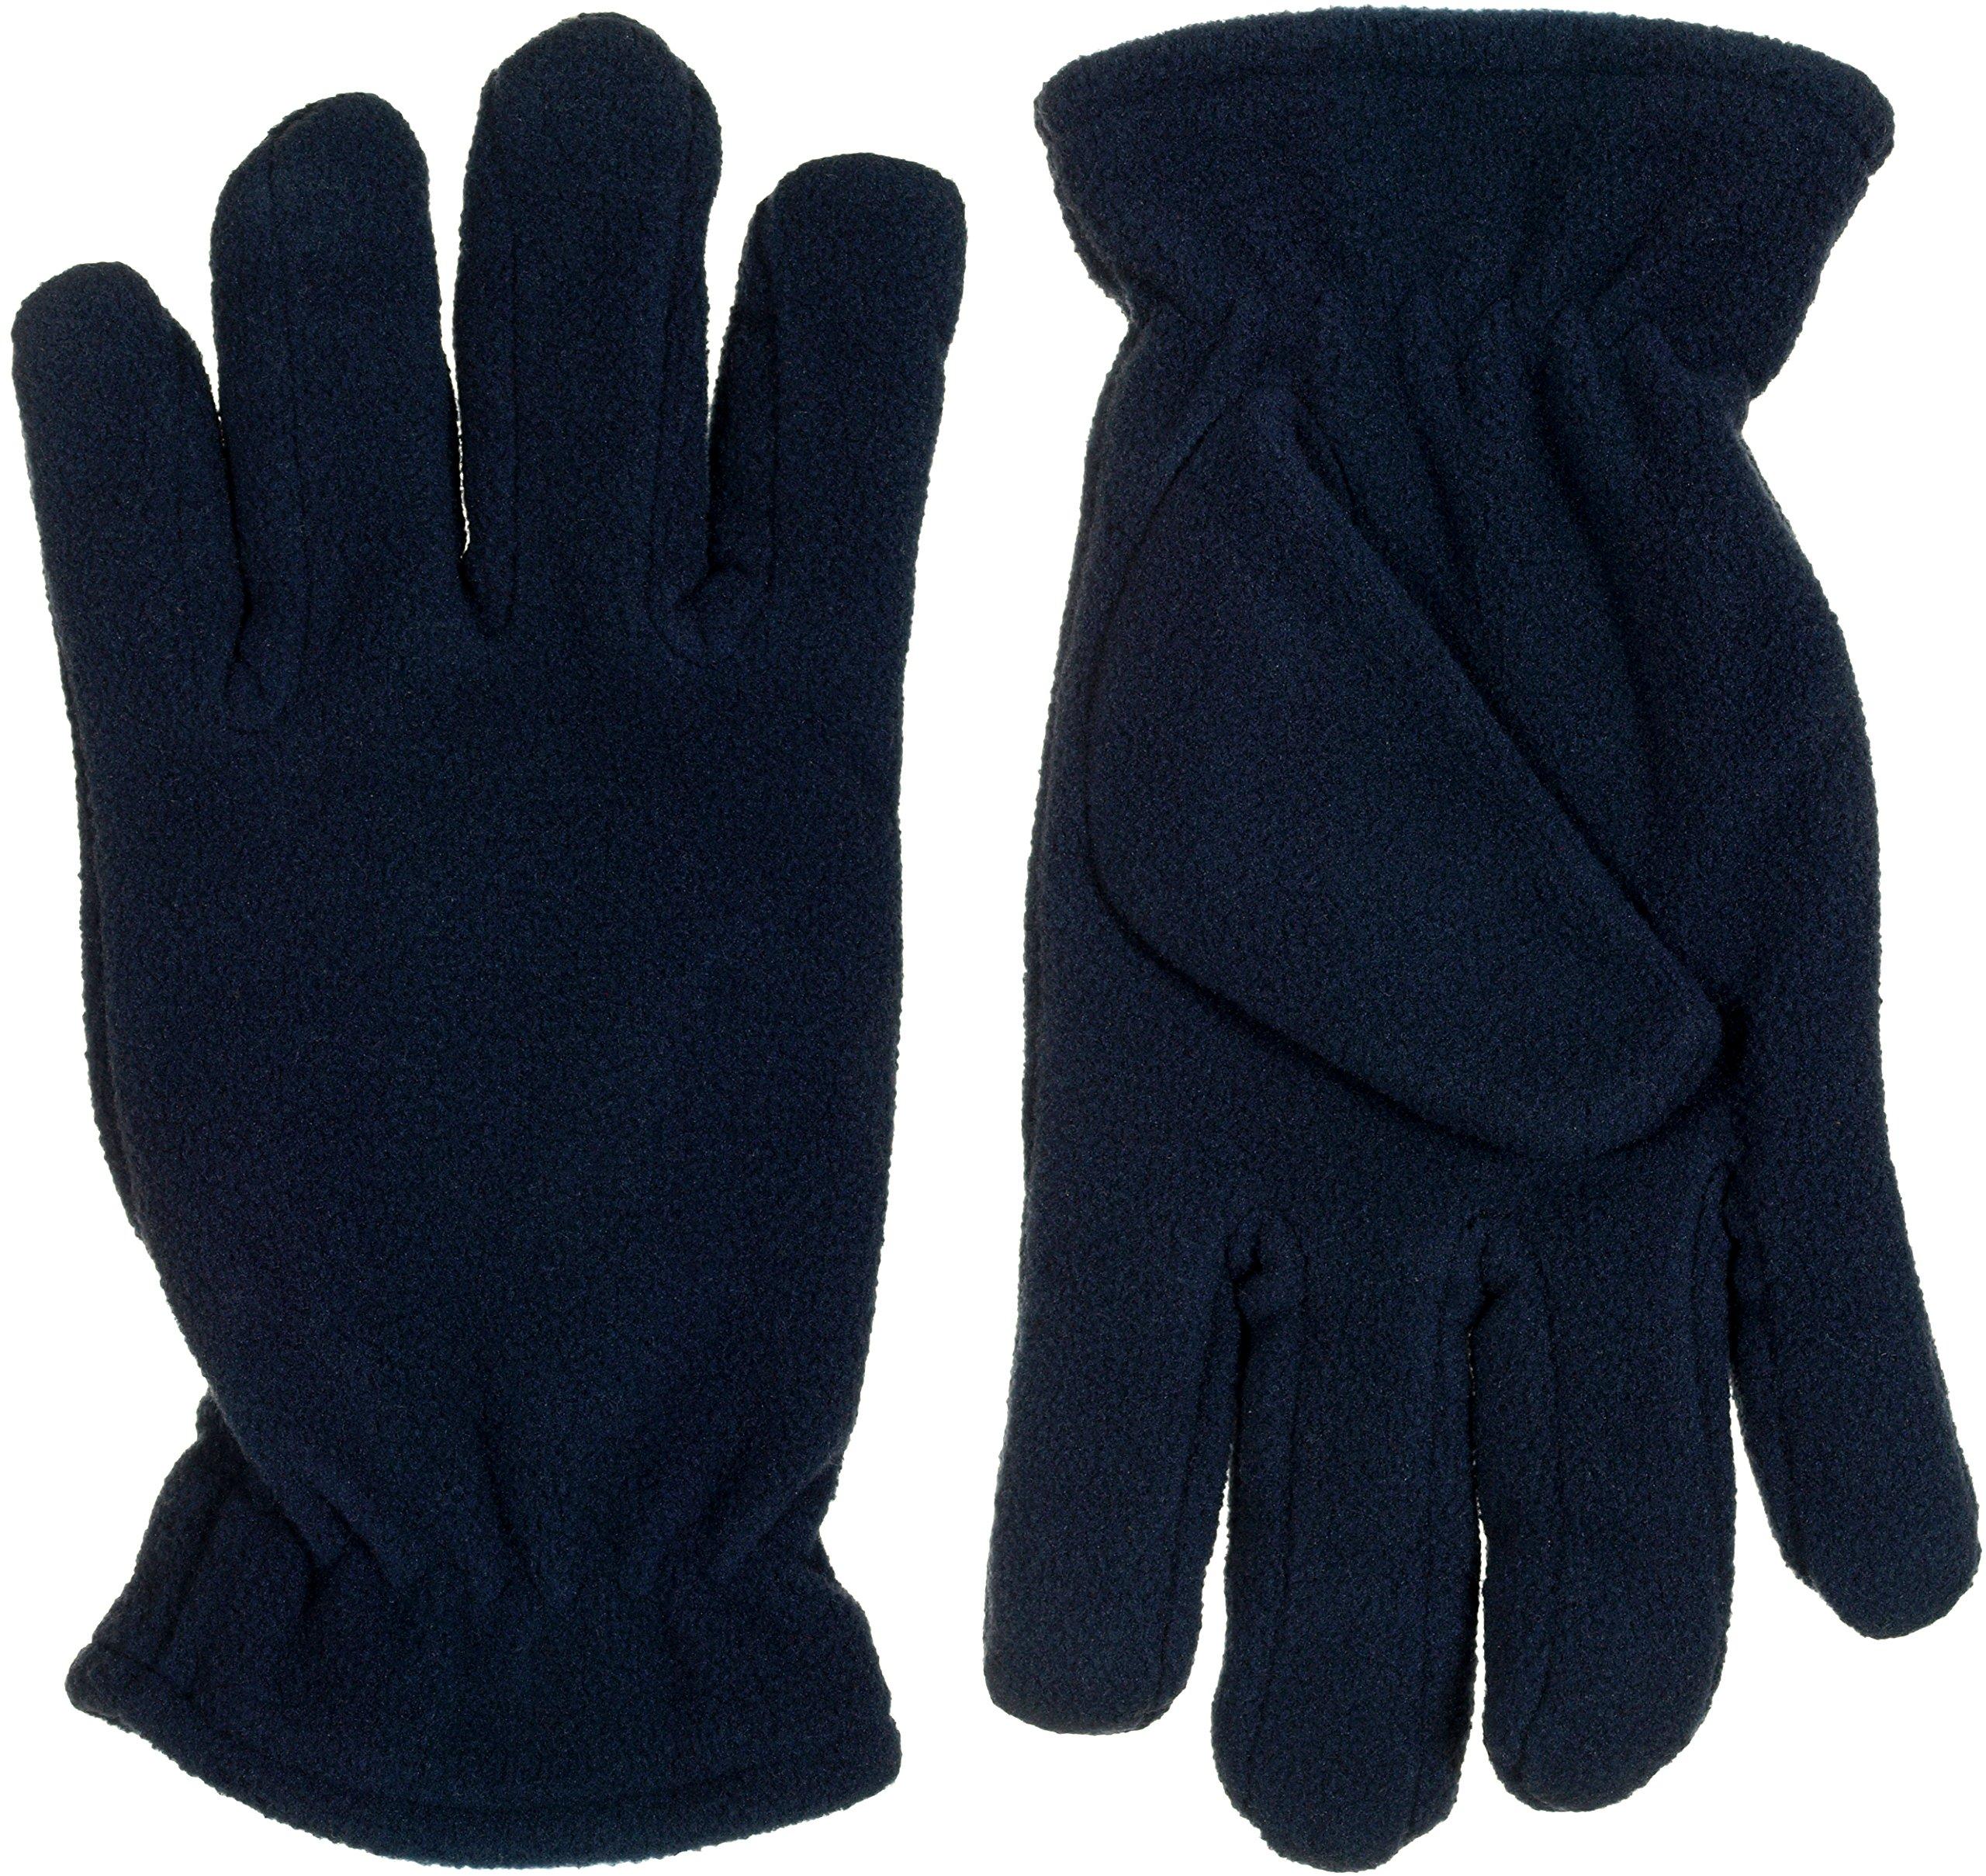 Grand Sierra Girls Fleece Cold Weather Gloves w/Fleece Lining (Large,Navy Blue)